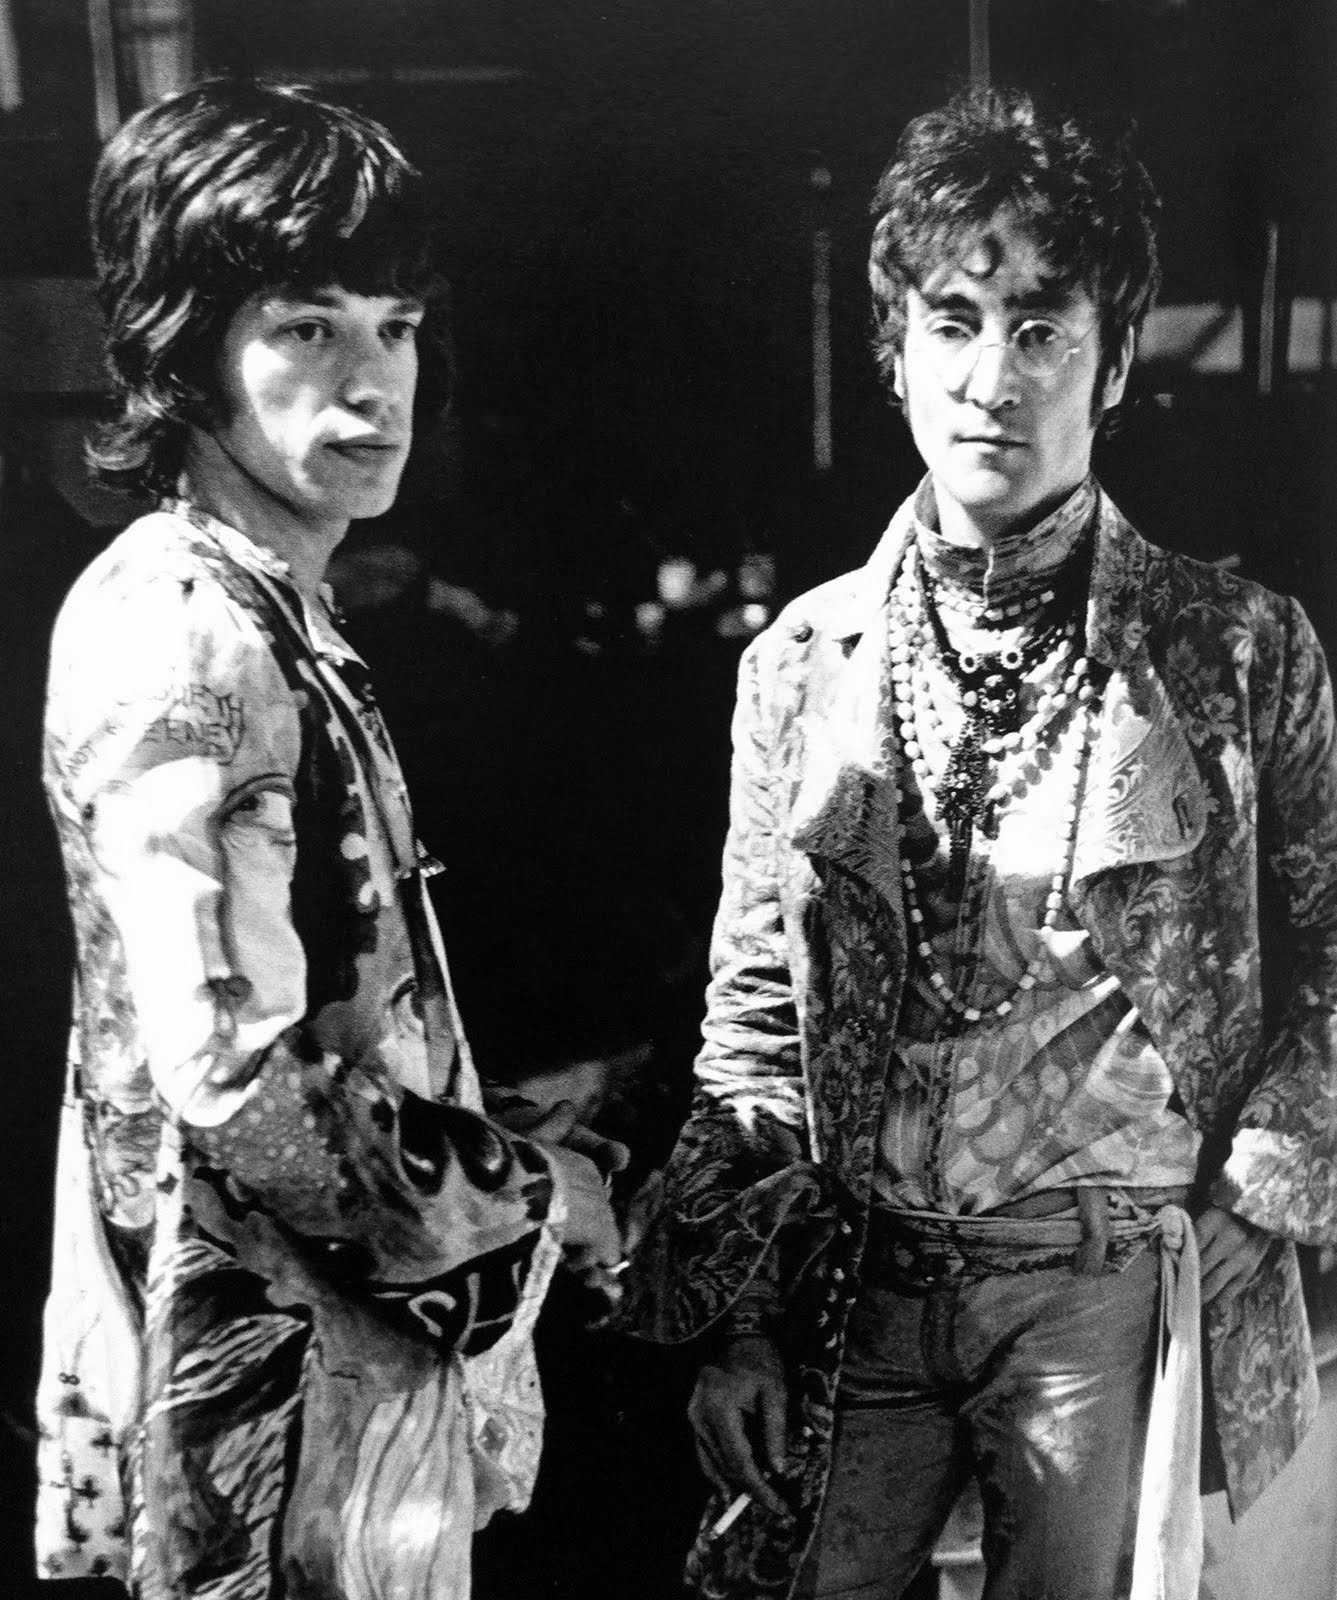 Mick Jagger & John Lennon